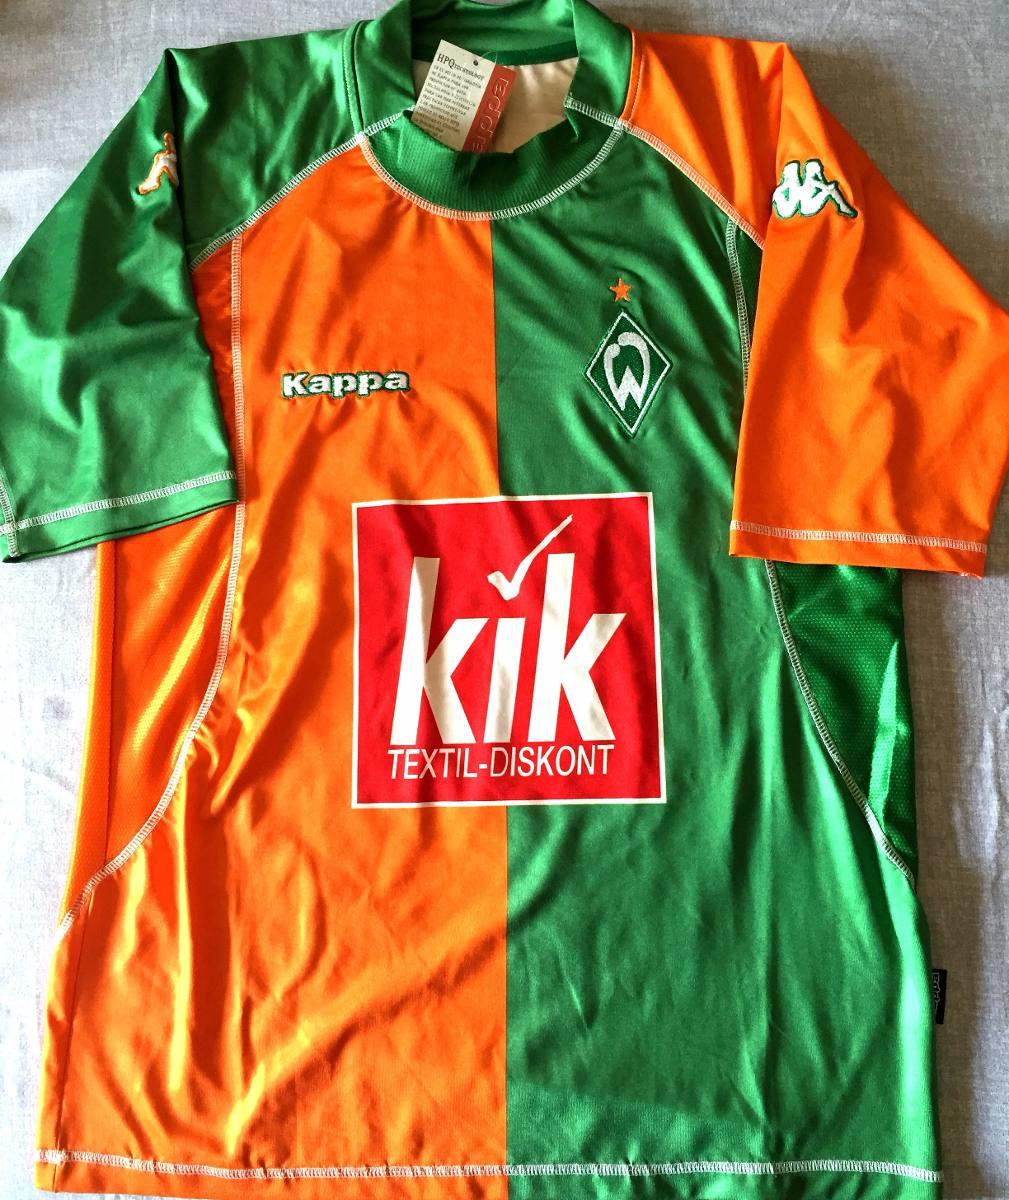 camisa werder bremen 2005-06 klose  11 kappa oficial. Carregando zoom. b6bbb736466d2